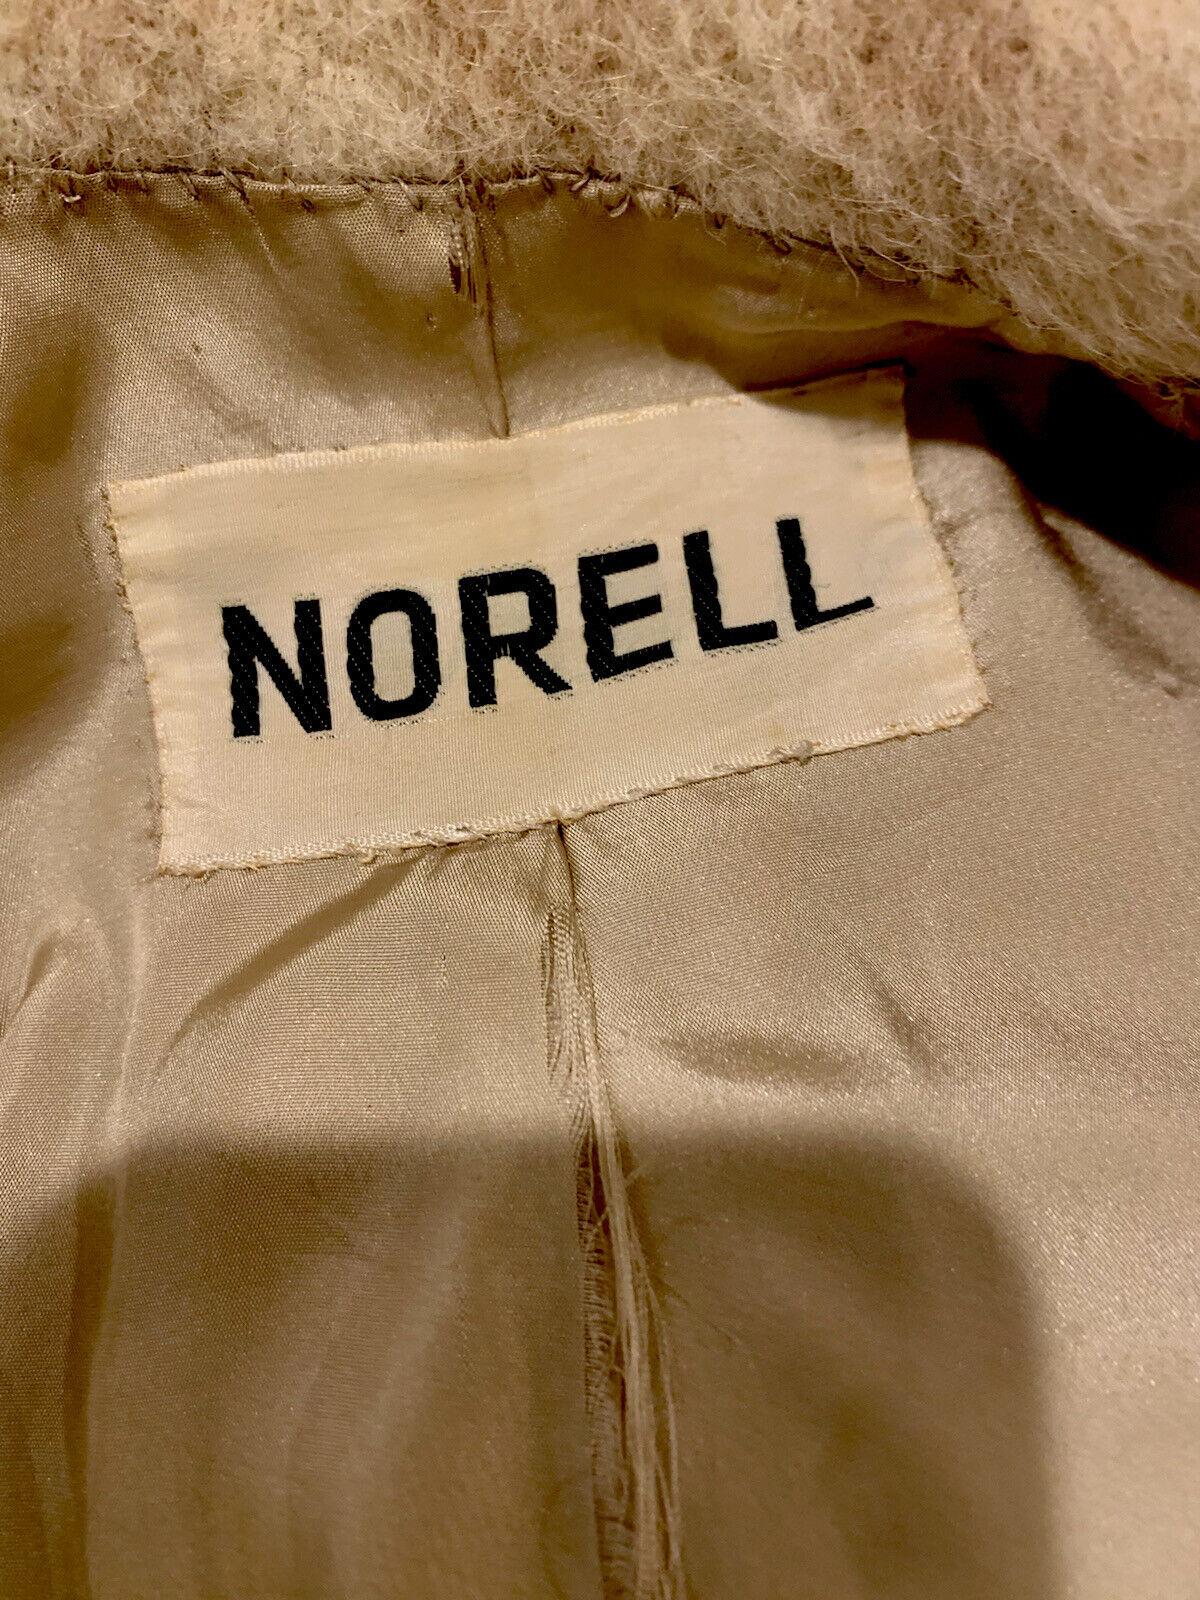 NORMAN NORELL Vtg Plaid Mohair Swing Coat Signatu… - image 2